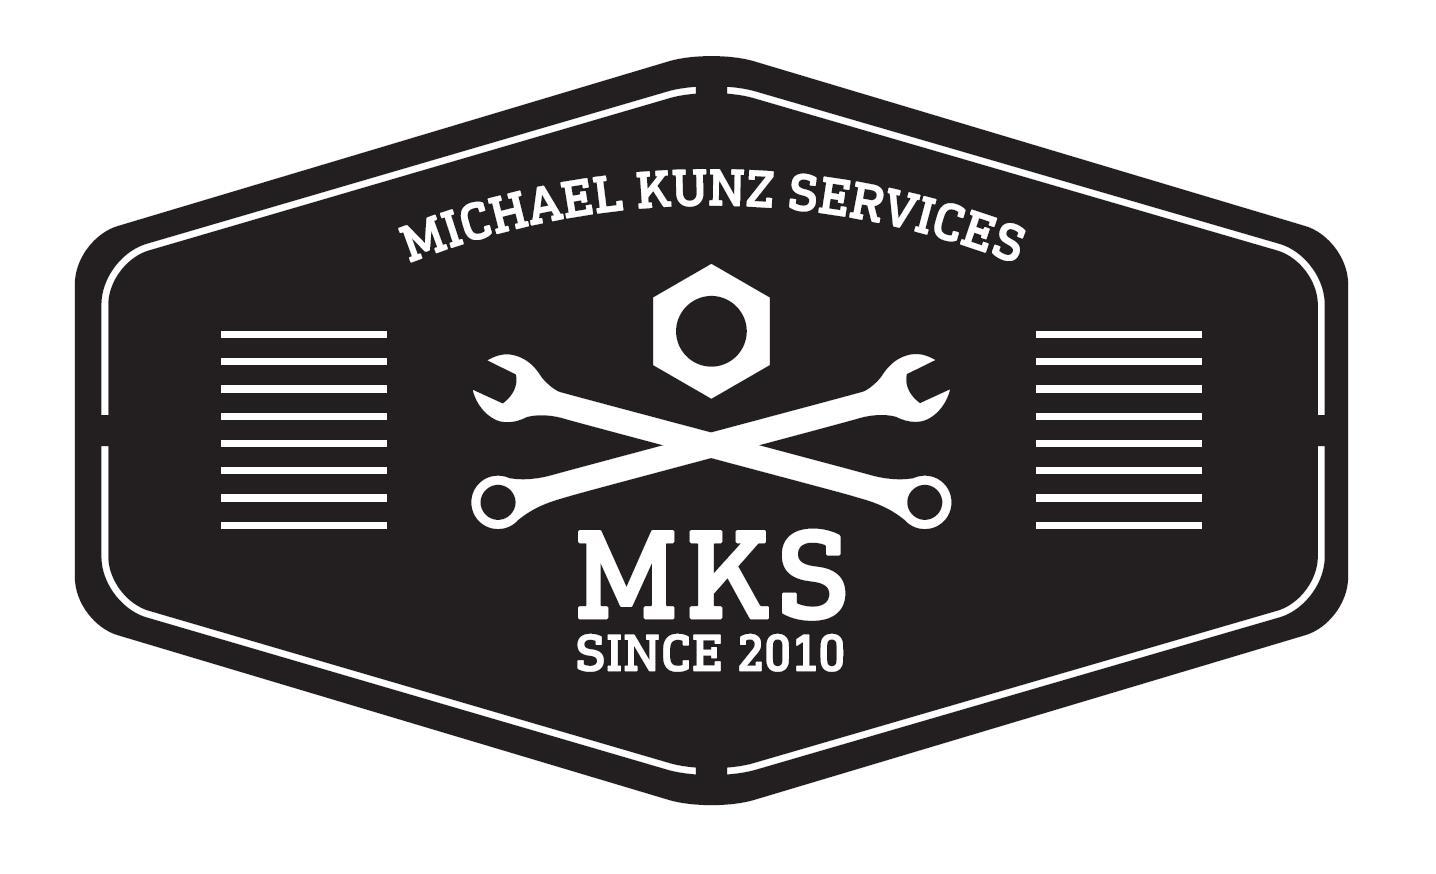 MKS – Michael Kunz Services AG